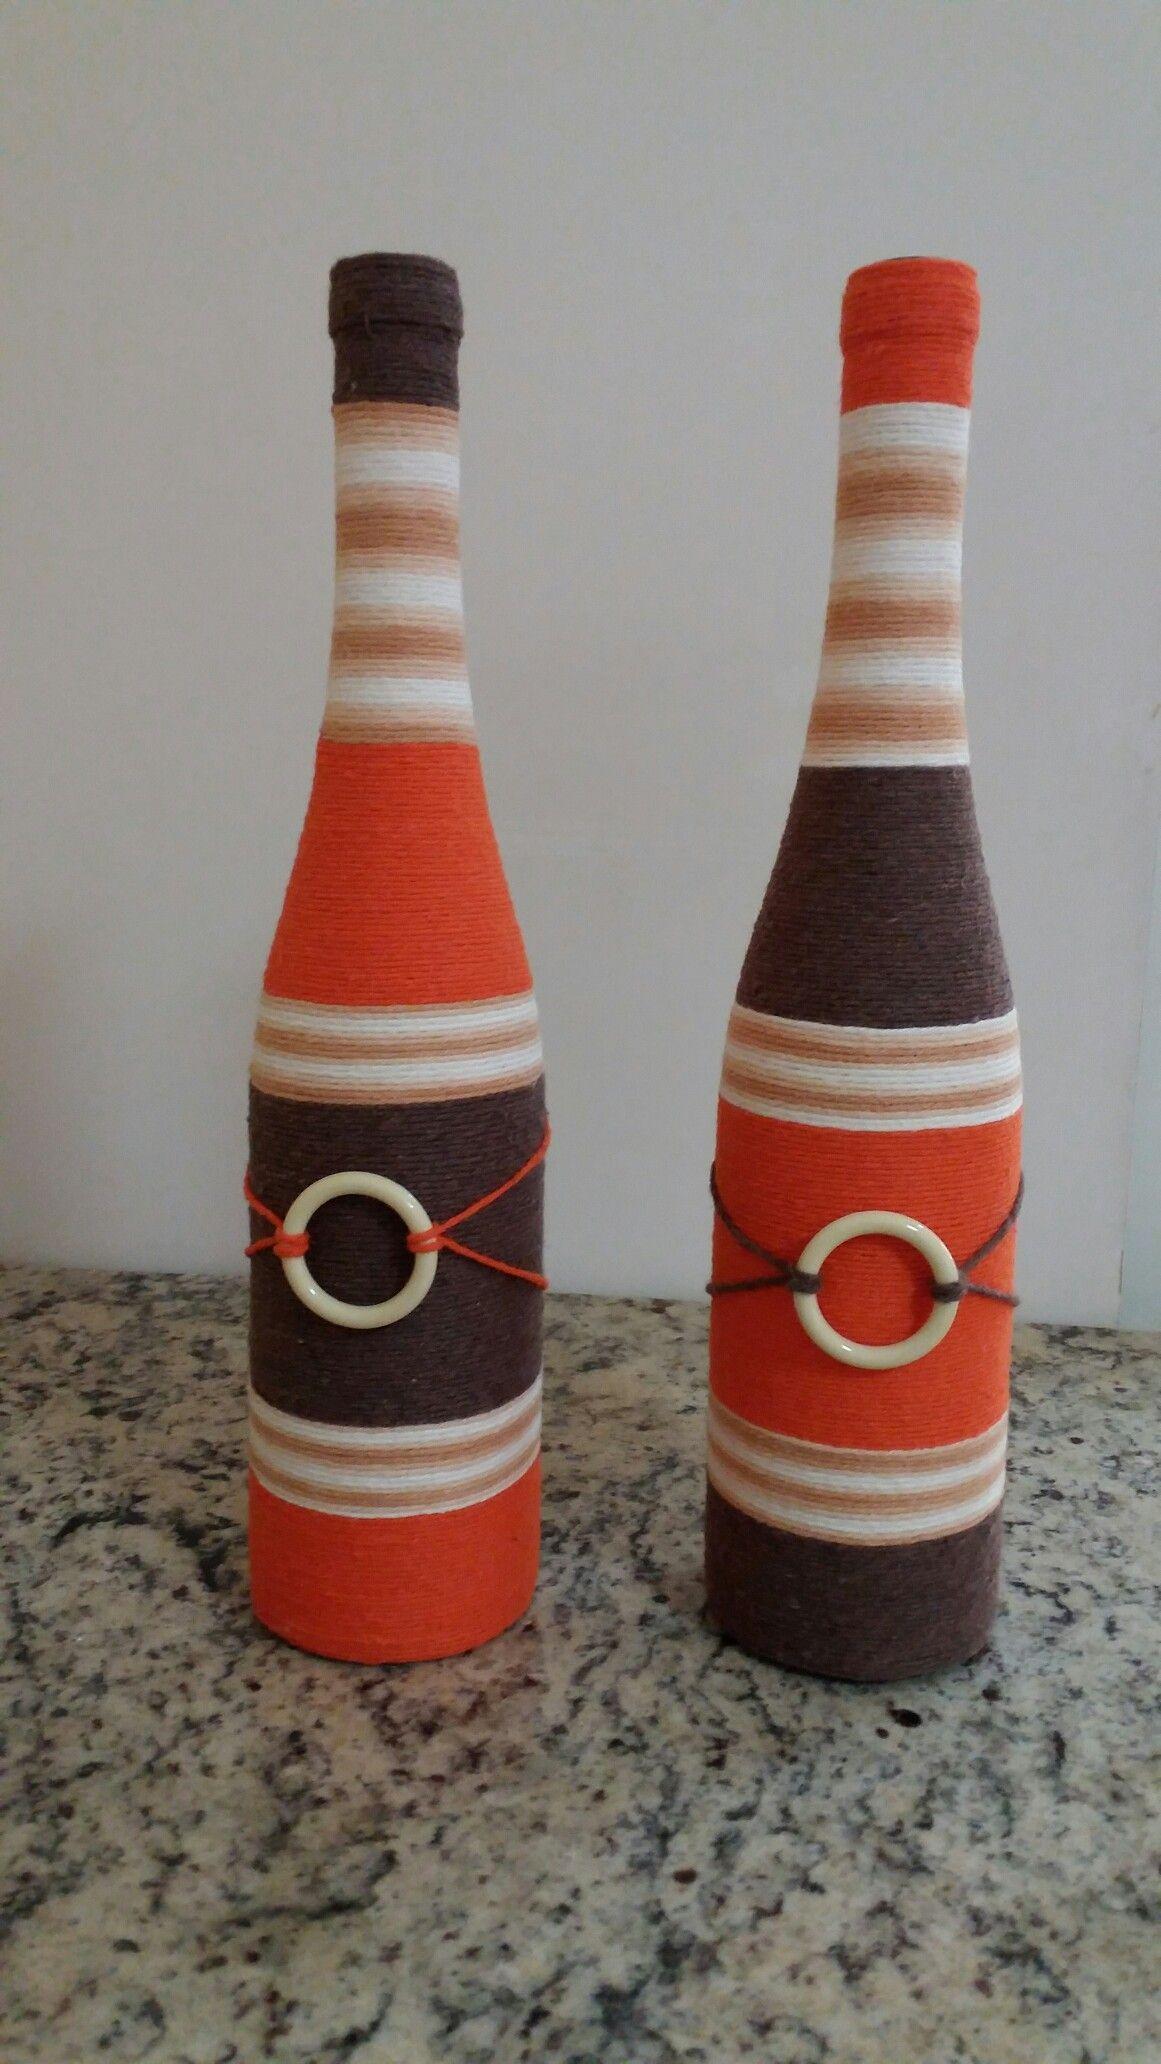 Botellas Decoradas Botellas Decoradas Para Navidad Botellas De Vidrio Decoradas Jarras Botellas Deco Bottle Crafts Wine Bottle Diy Crafts Wine Bottle Crafts